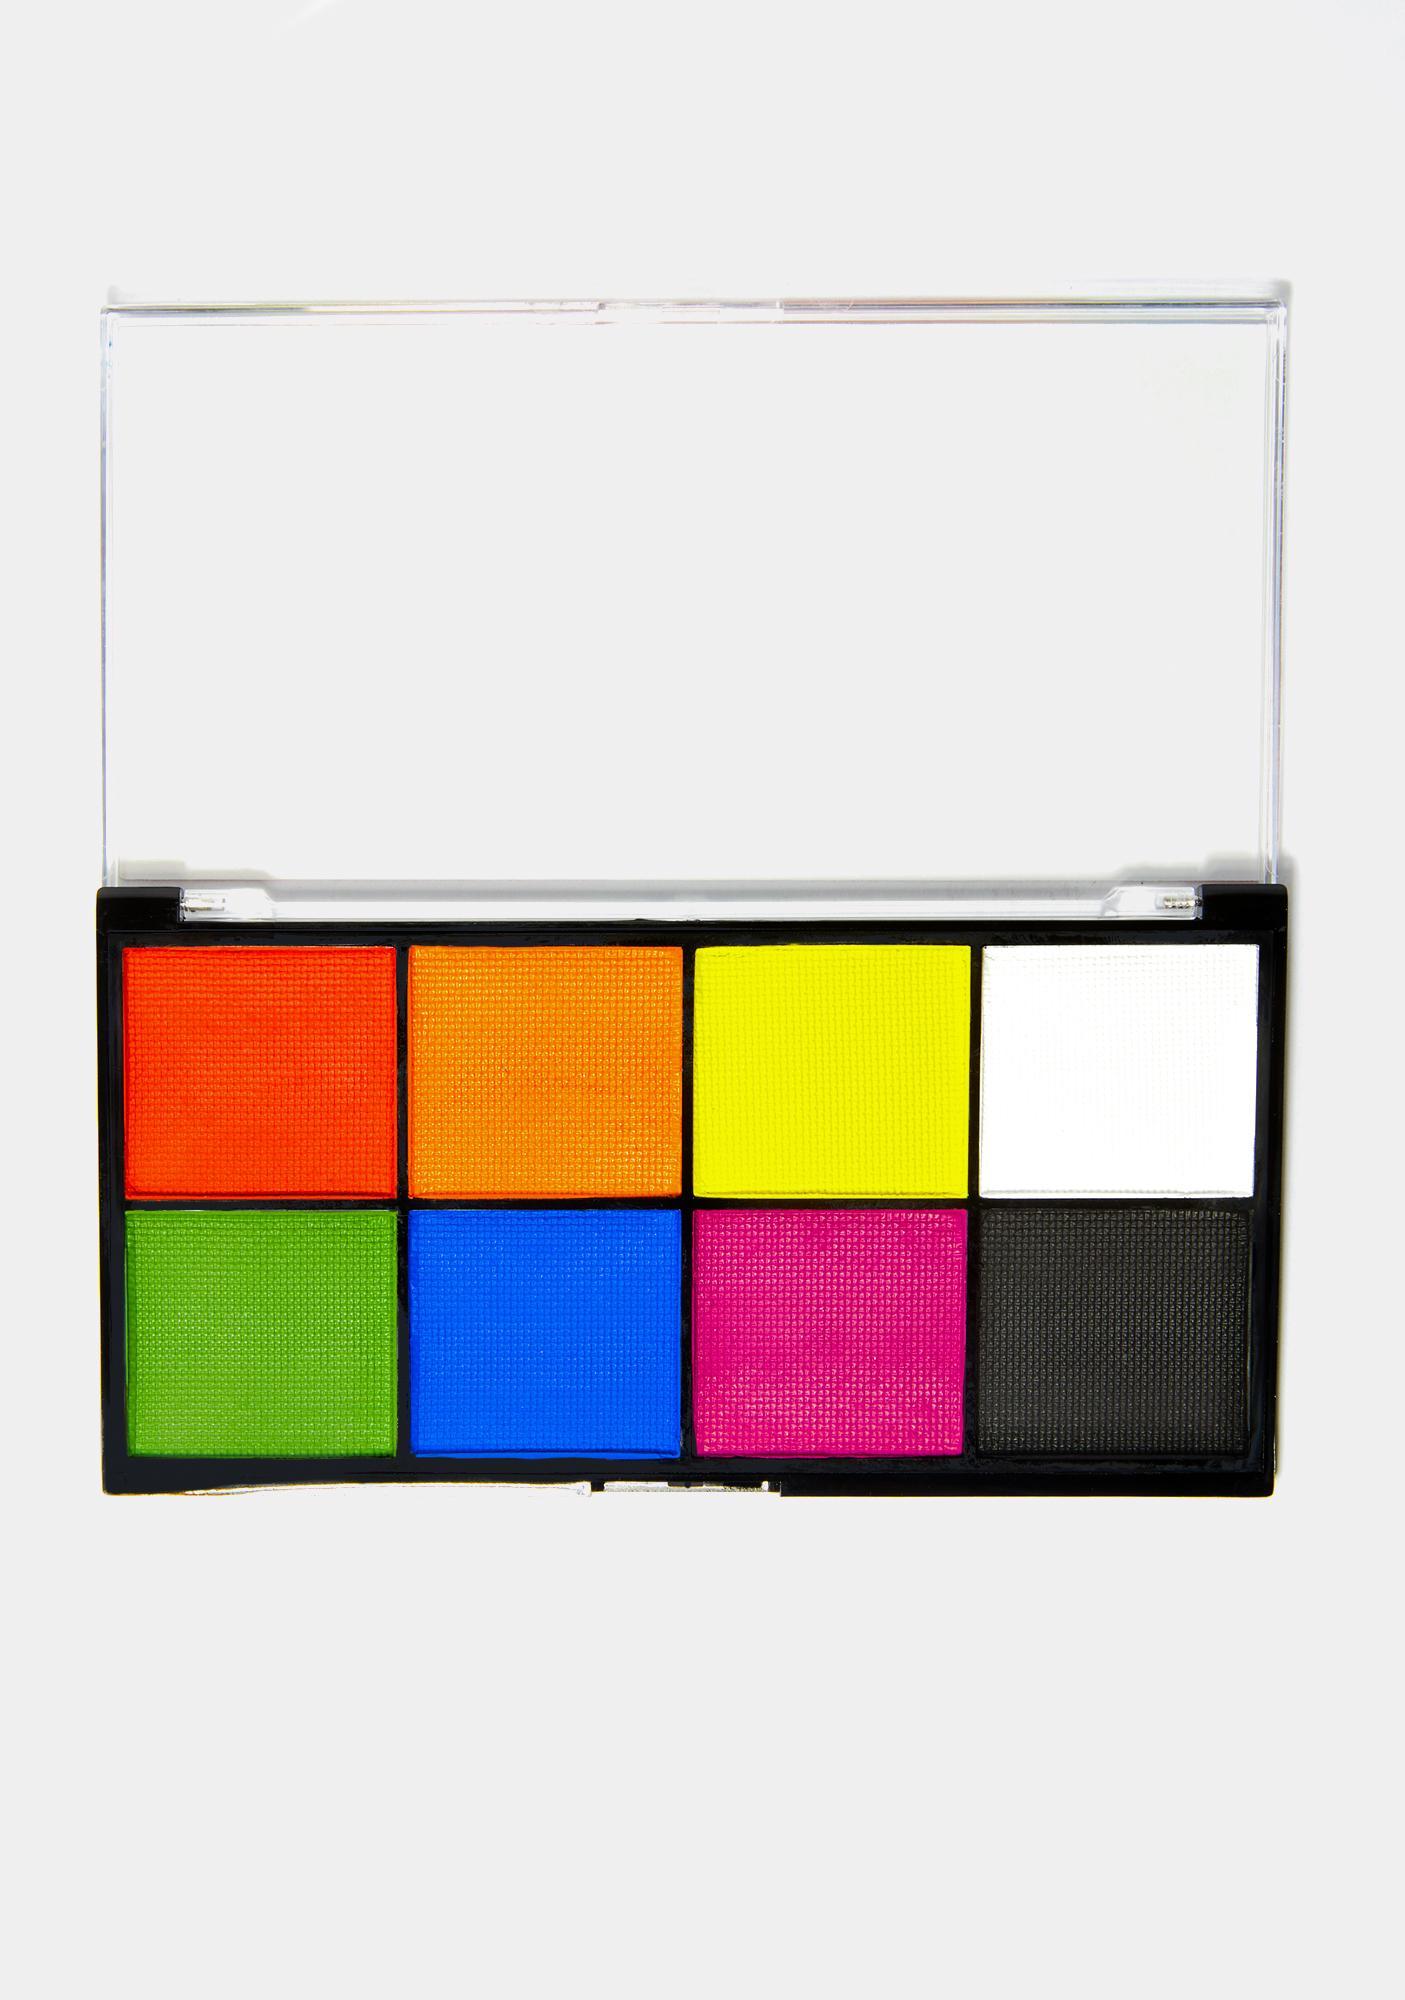 Chaotic Cosmetics Retro Rainbow Hydro Eyeshadow Palette